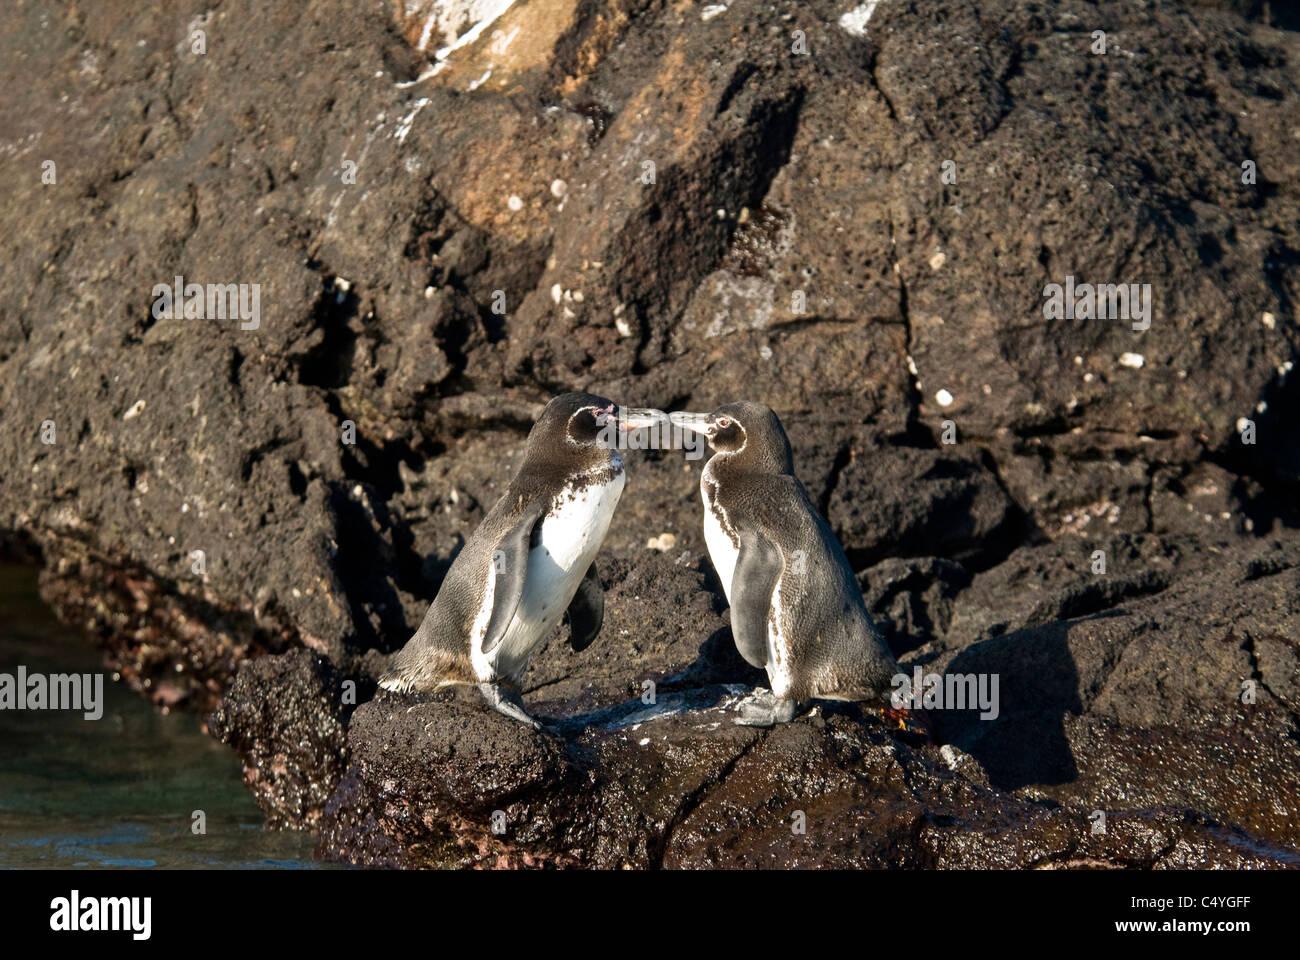 Endangered Galapagos penguins (Spheniscus mendiculus) on Bartolome Island in the Galapagos Islands Ecuador - Stock Image